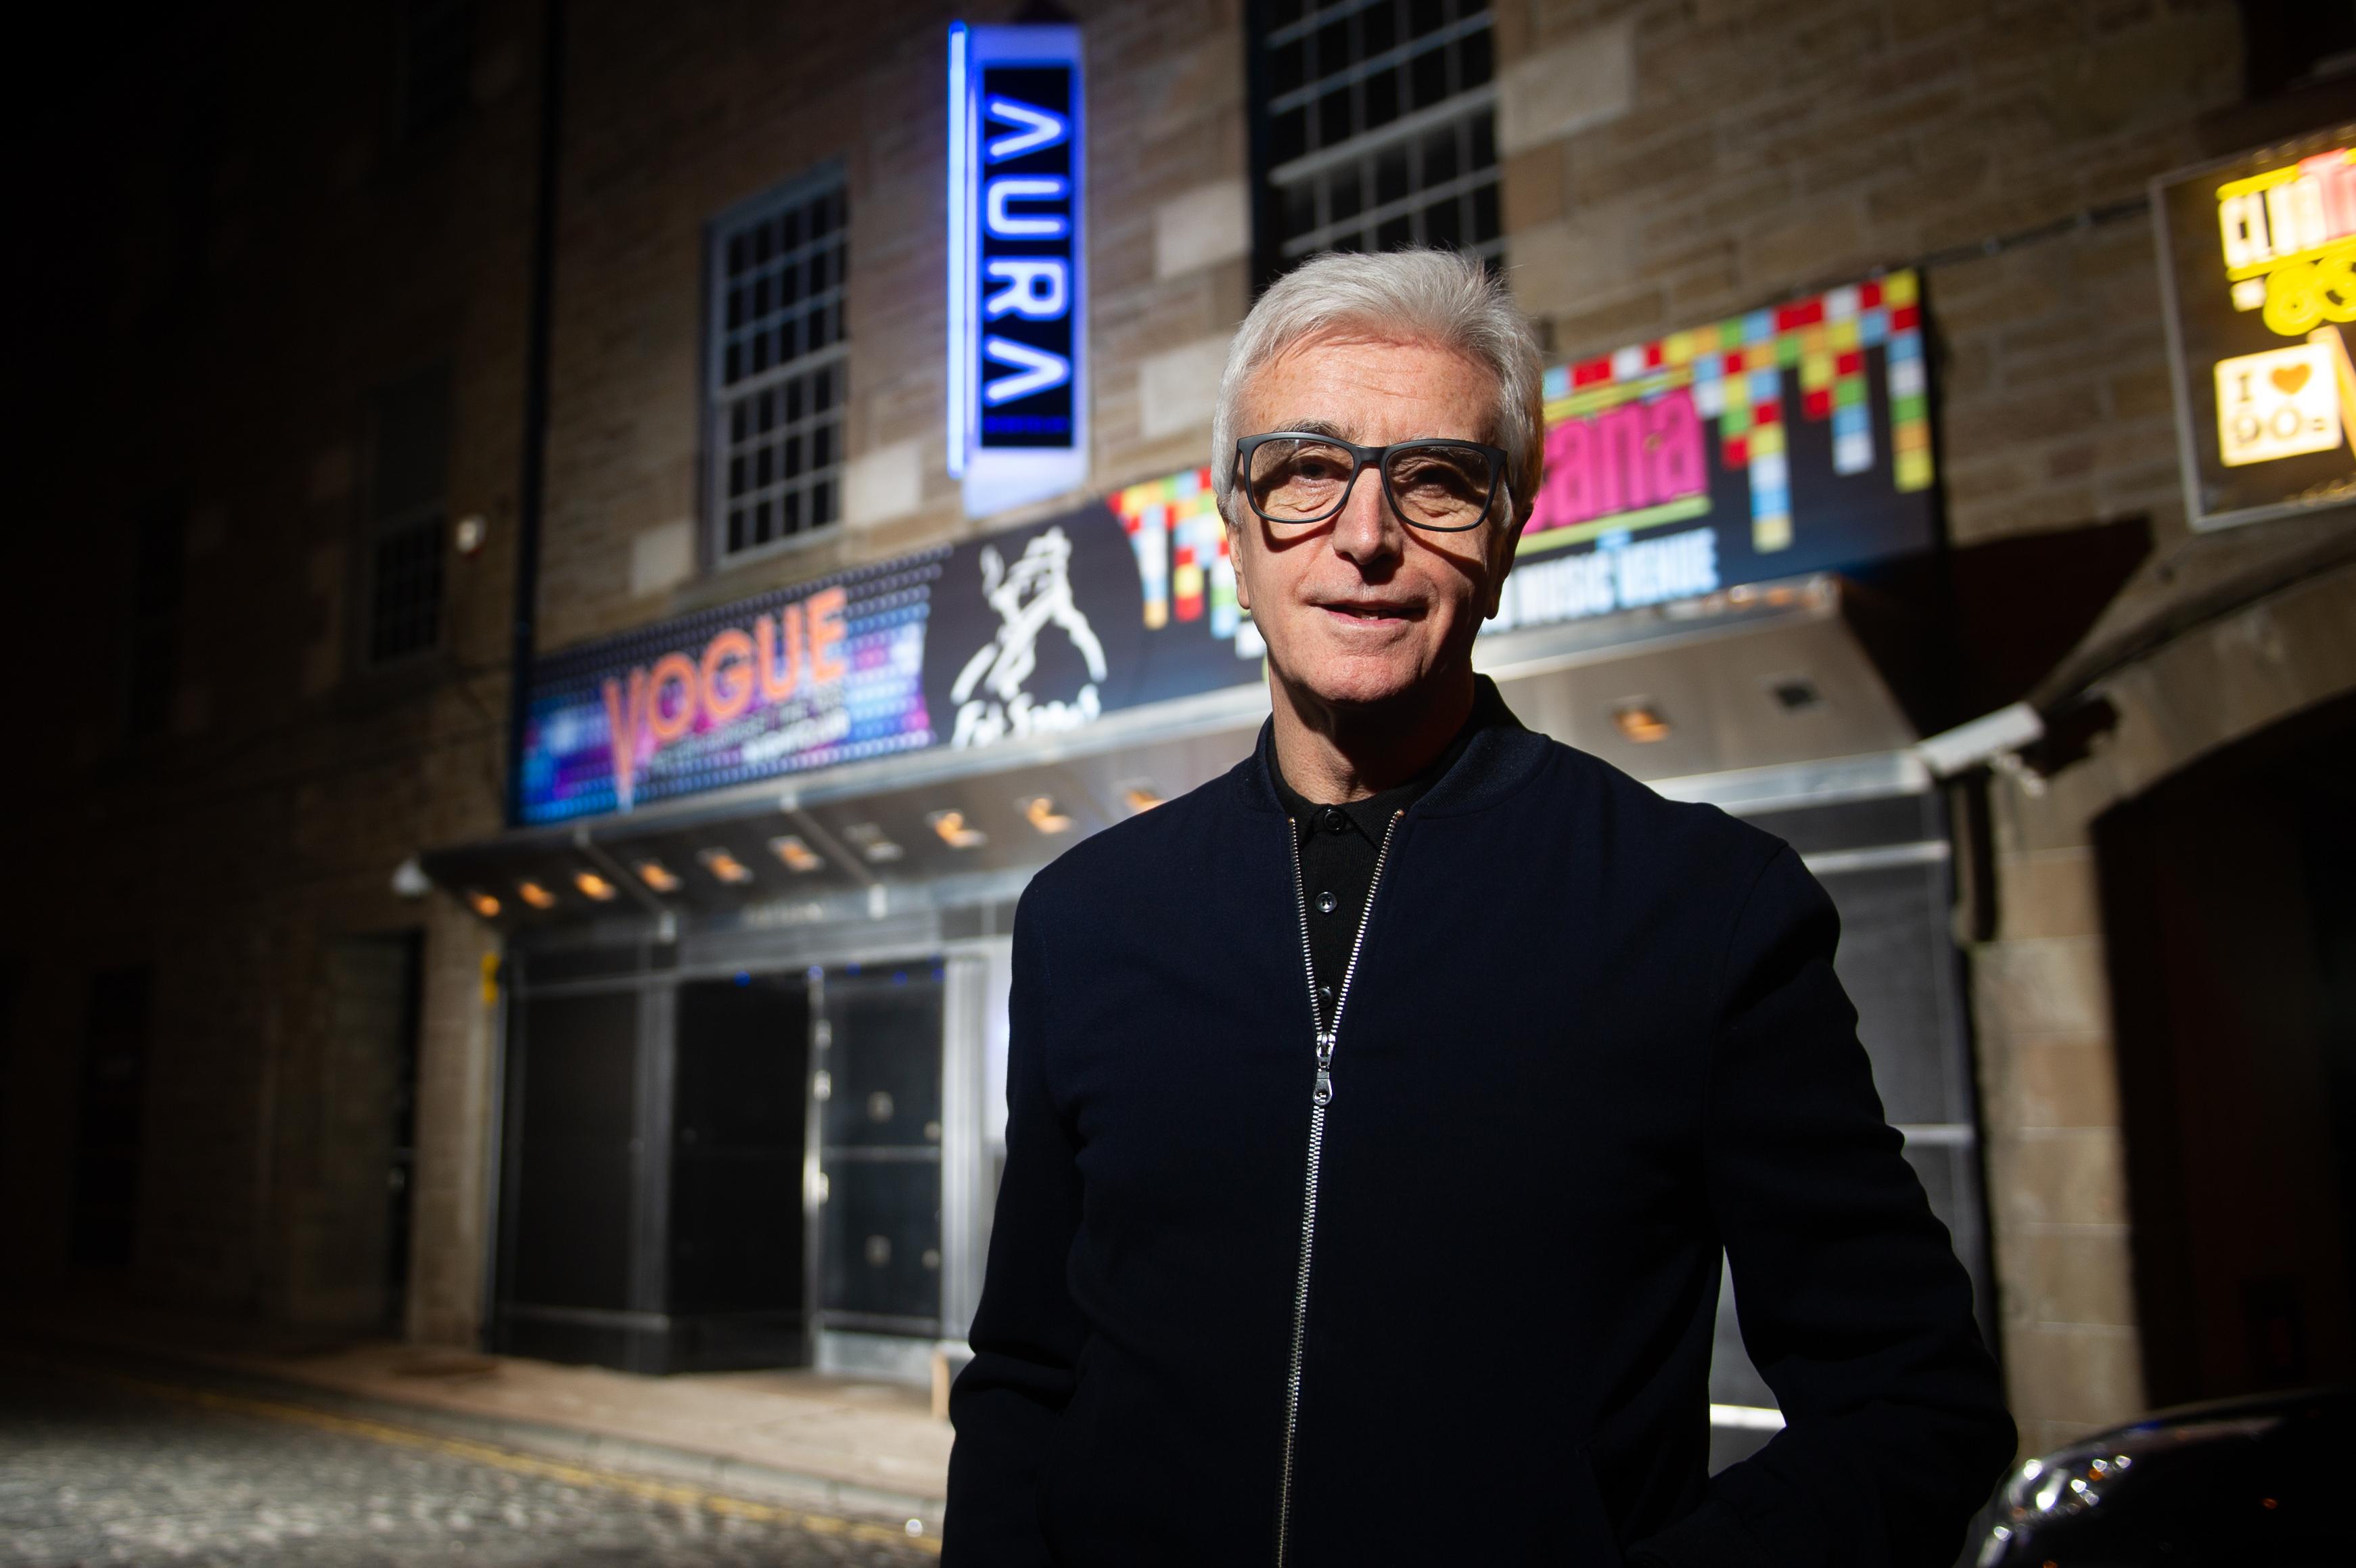 Dundee businessman Tony Cochrane